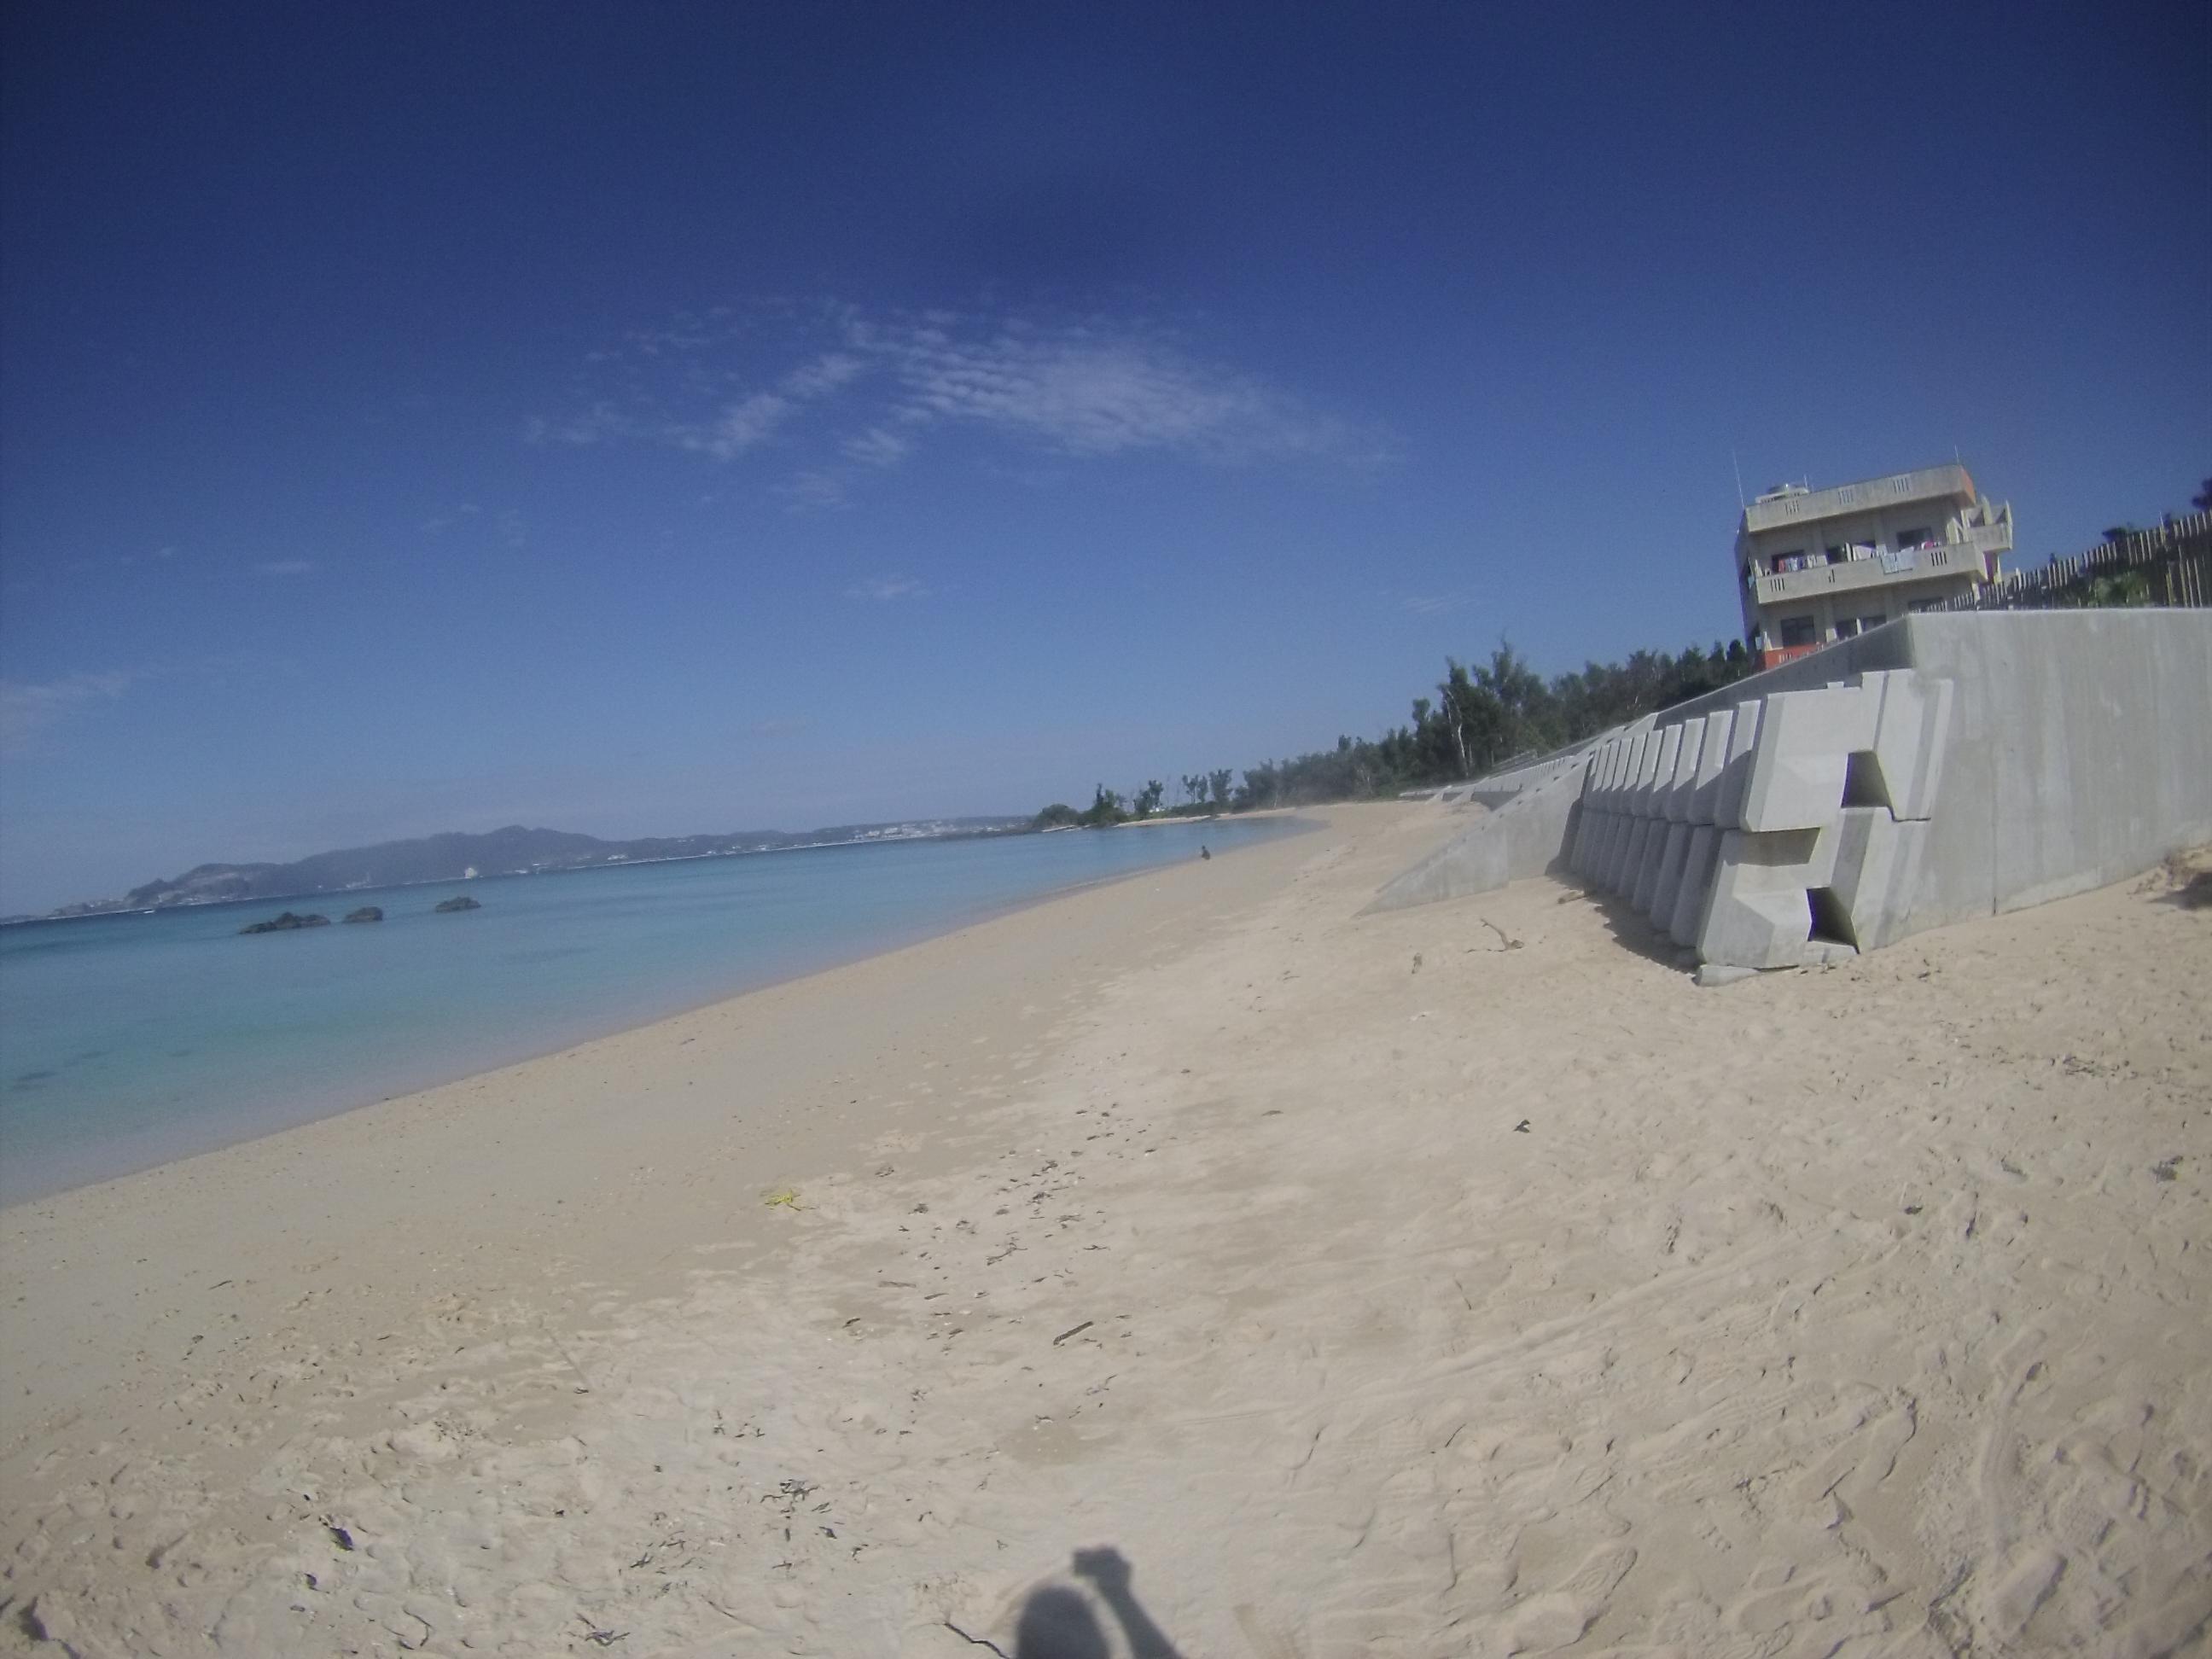 NICE SEND BEACH